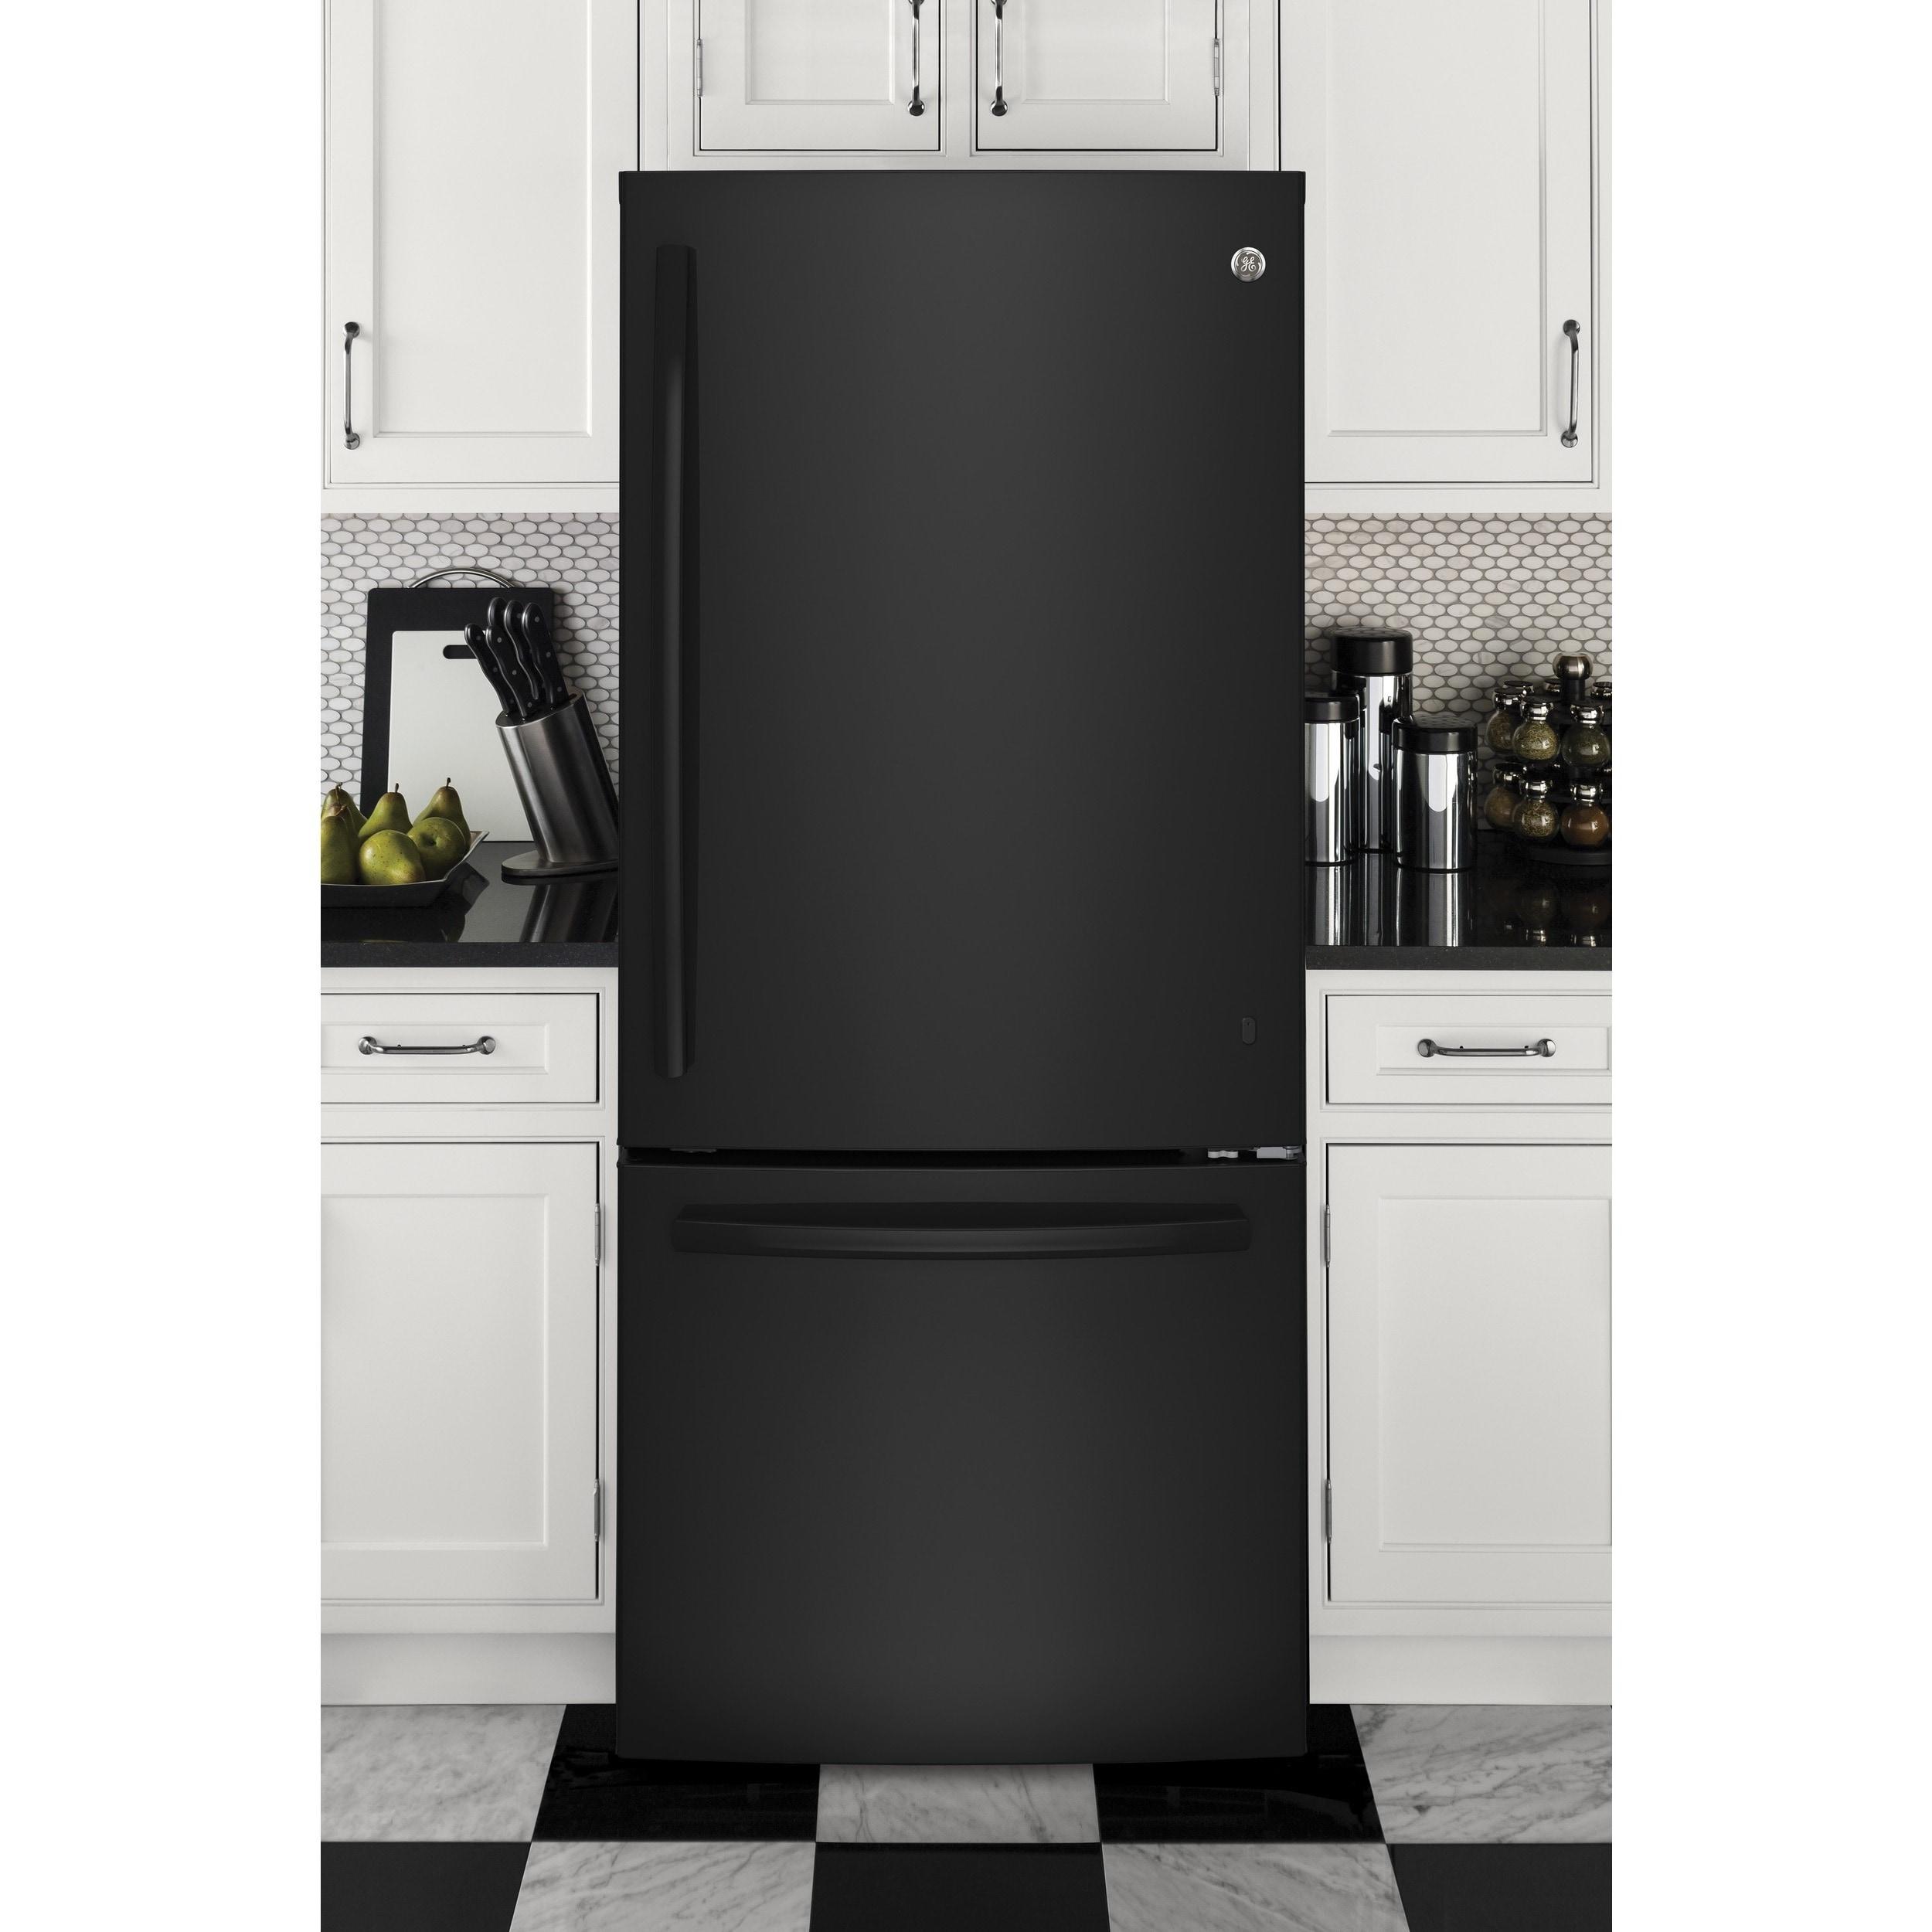 GE Series Energy Star 20.9 Cubic-feet Bottom Freezer Refr...